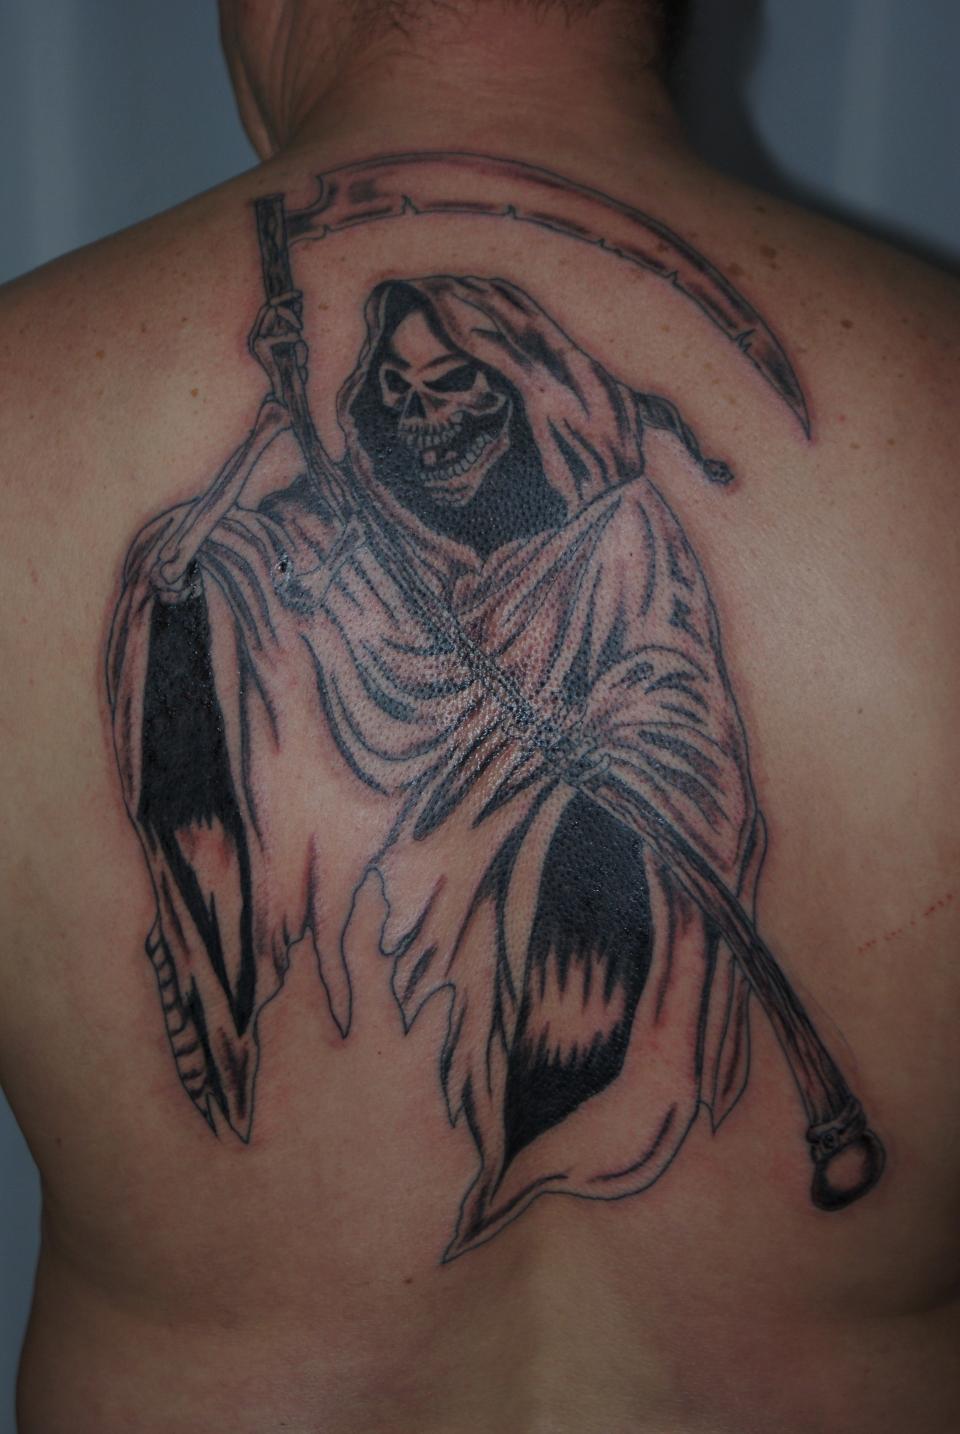 Tattoo volution serge tatoueur pierceur depuis plus - Tatouage la mort ...